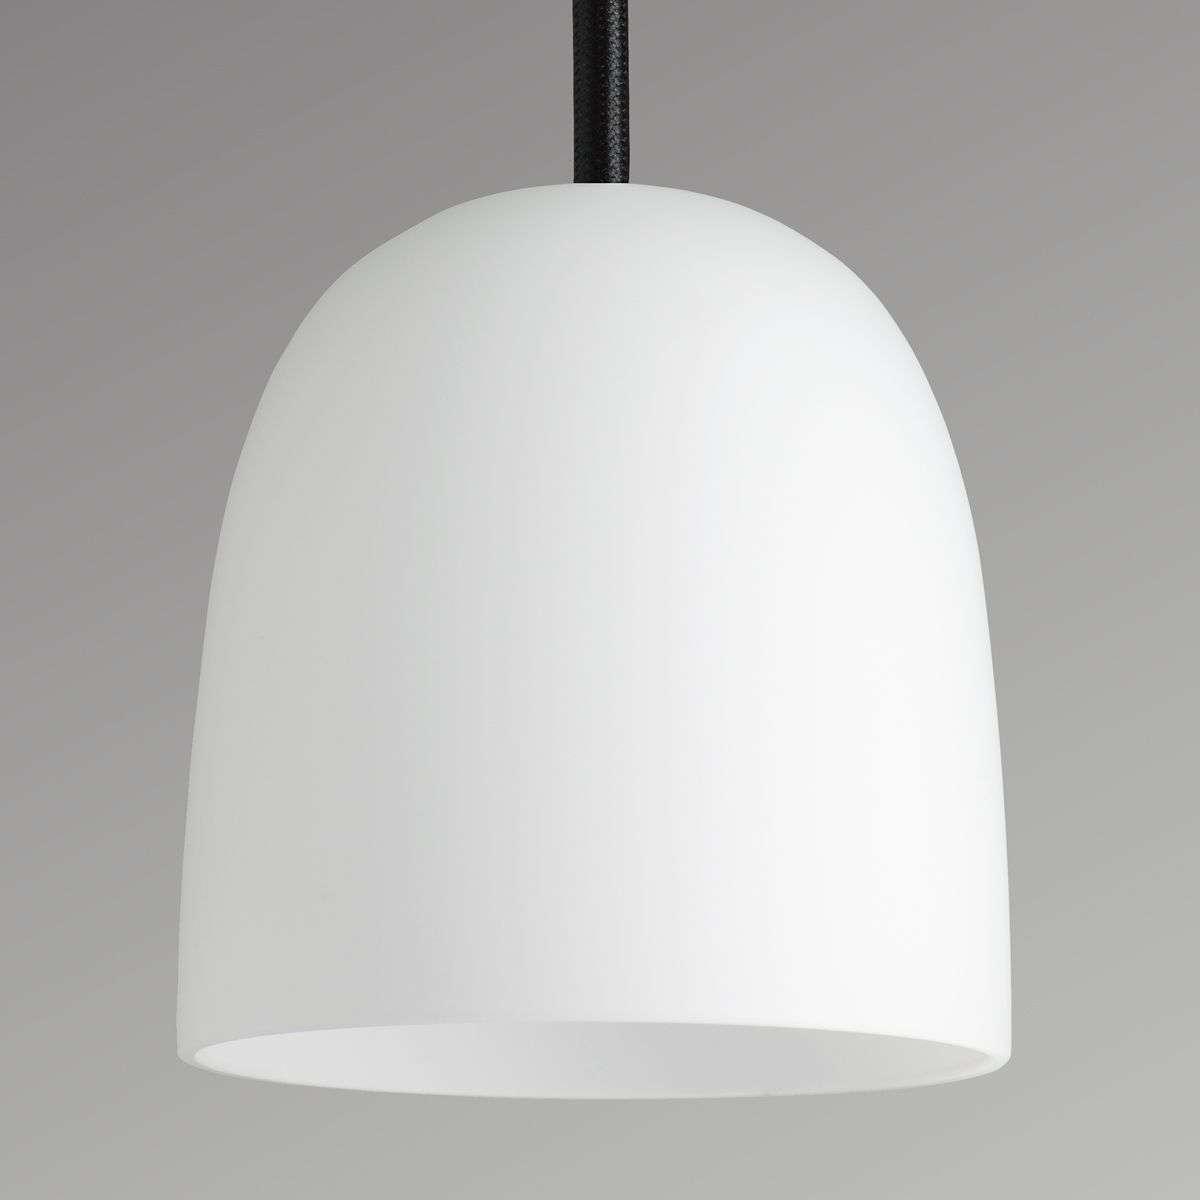 Super small designer pendant light white-7589015-31 & Super small designer pendant light white | Lights.ie